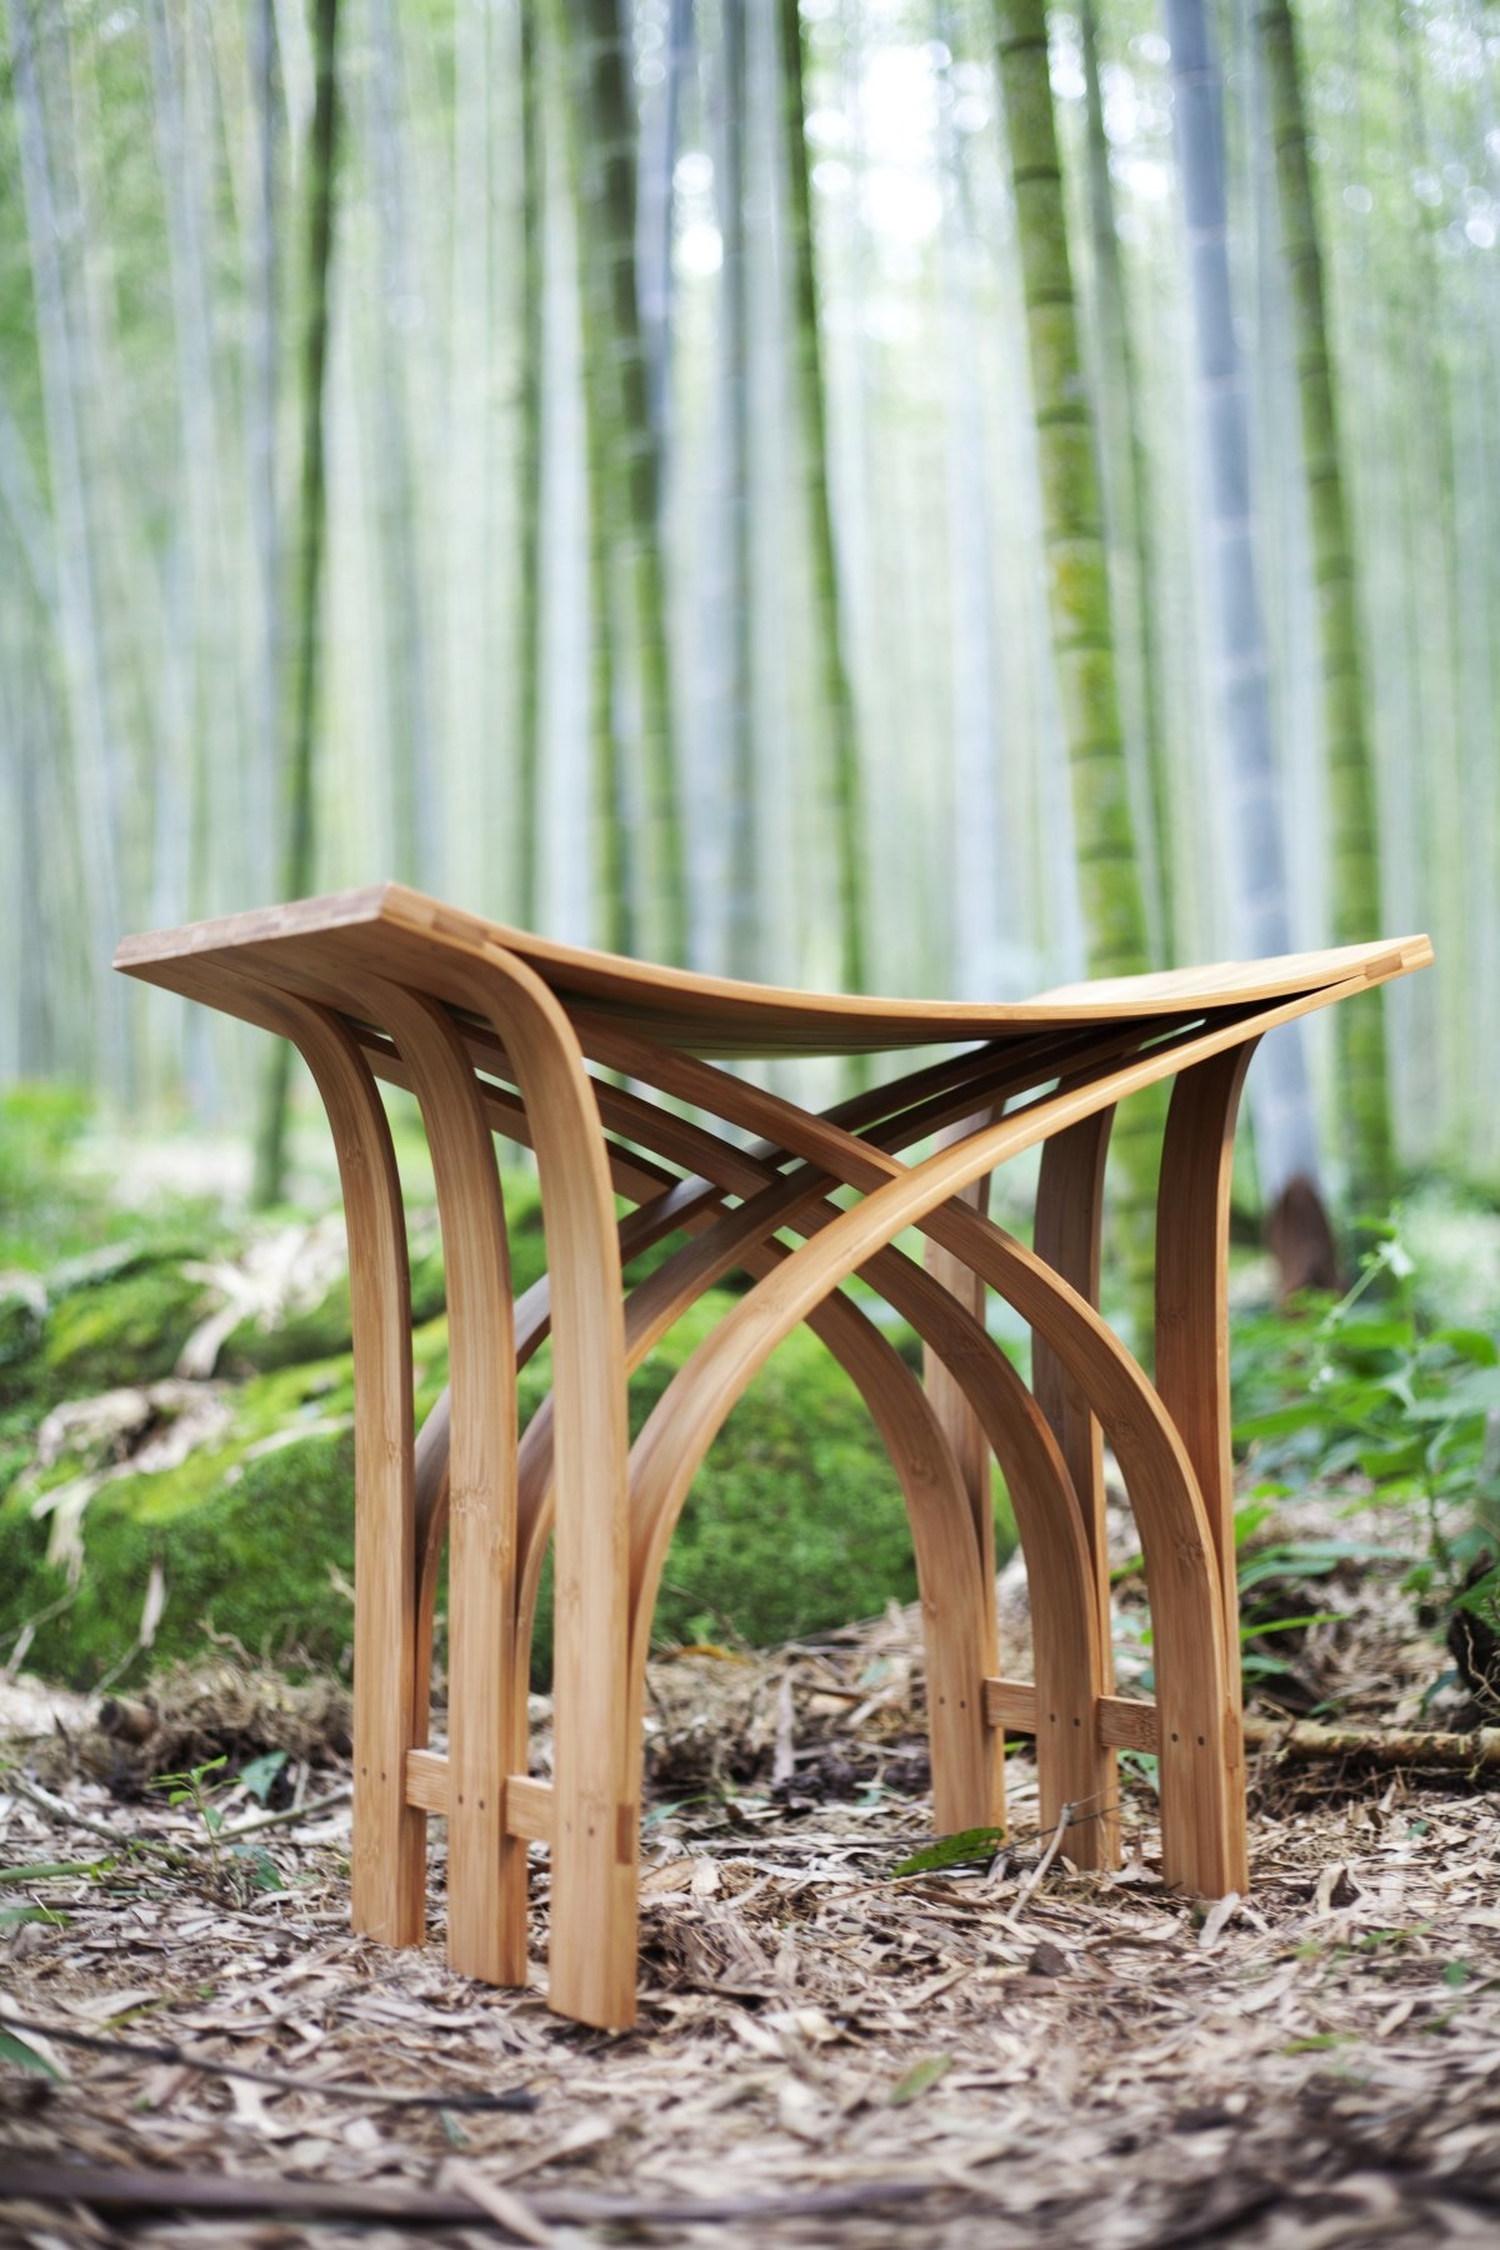 Flexible bamboo stool by grass studio karmatrendz